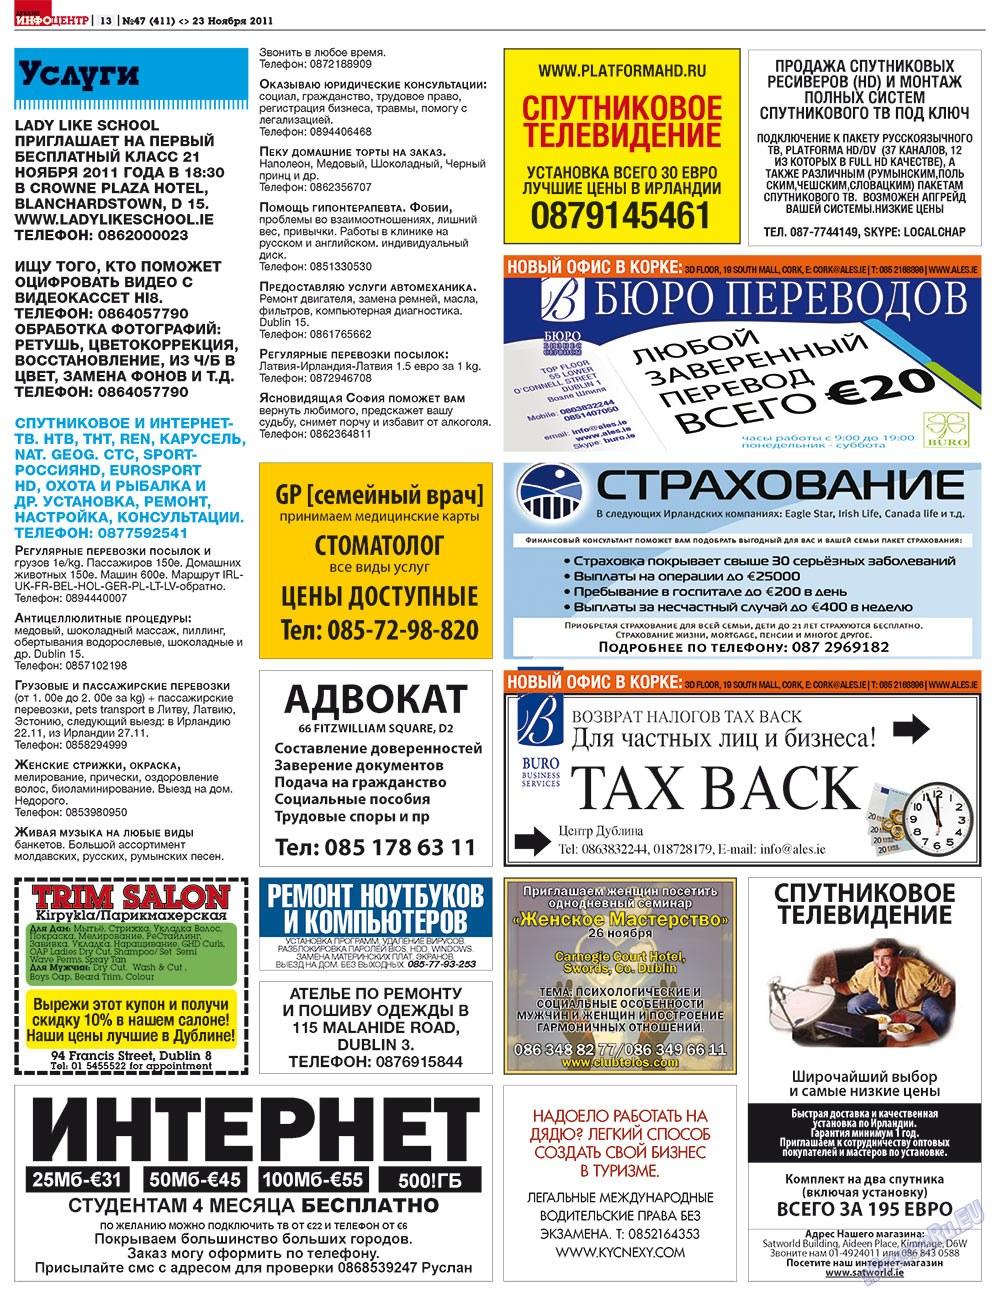 Дублин инфоцентр (газета). 2011 год, номер 47, стр. 13